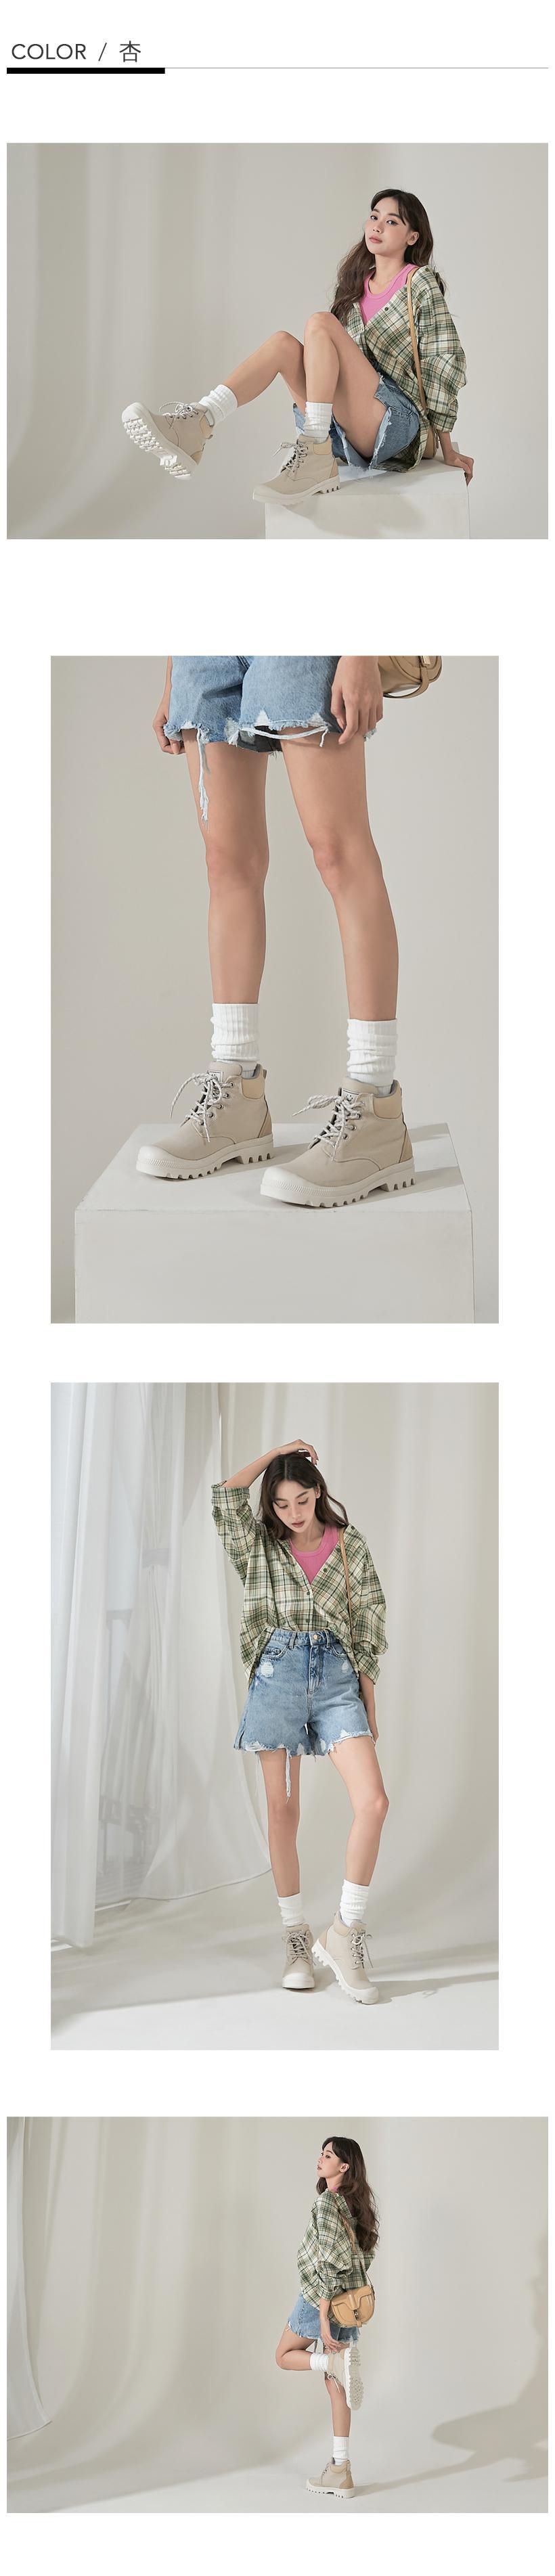 NeuTral-防潑水保暖郊山靴(杏)-大尺碼